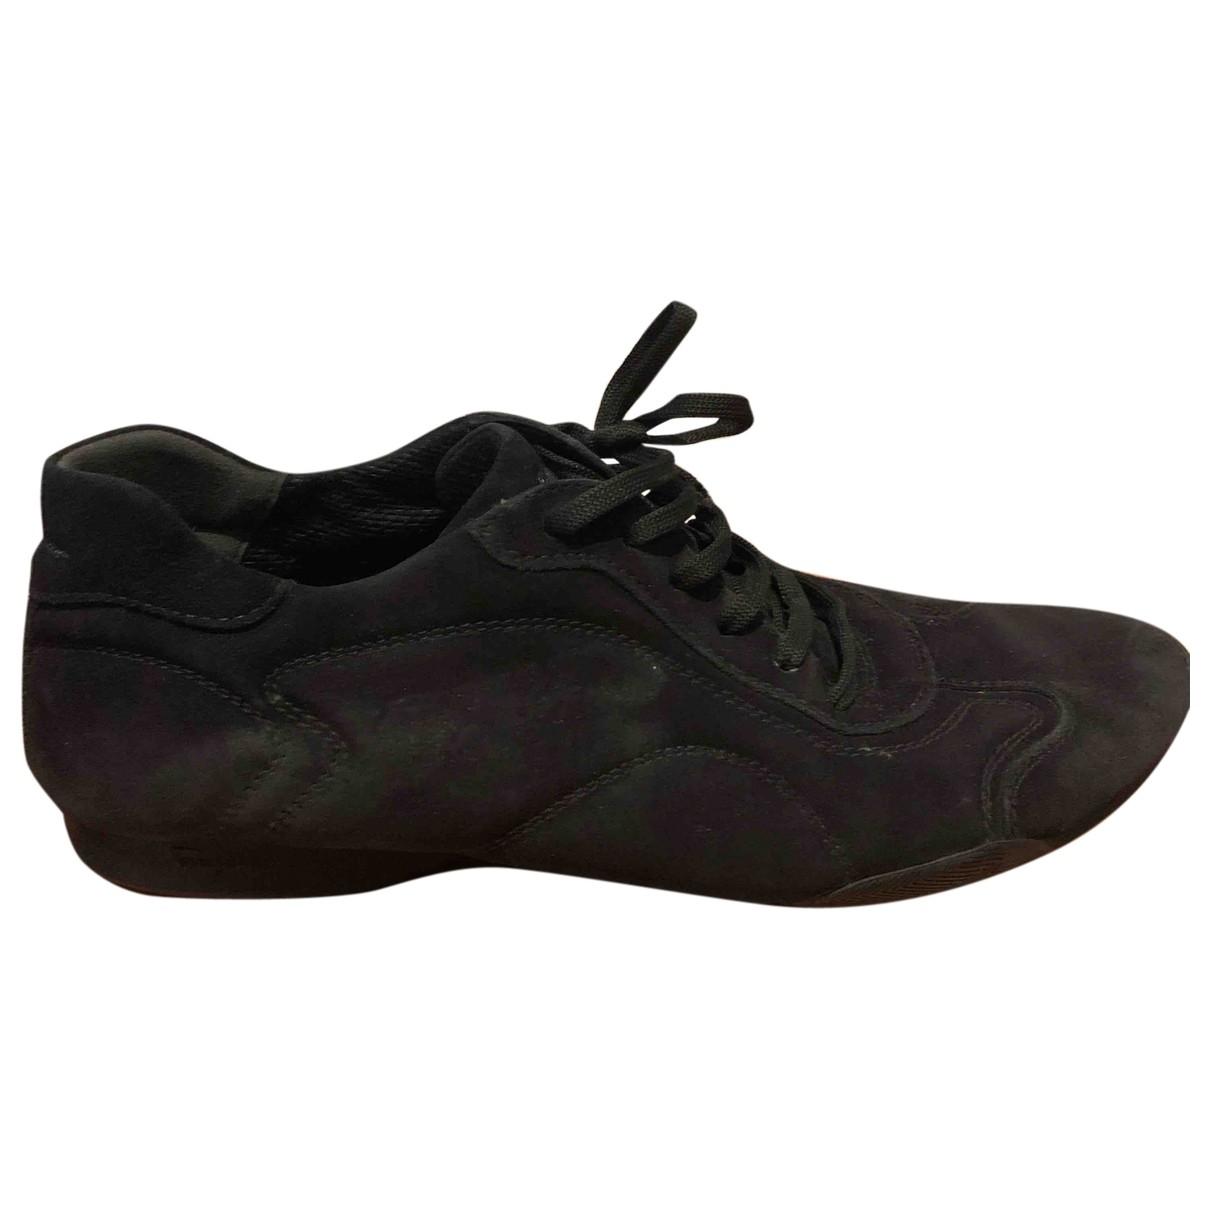 Salvatore Ferragamo \N Black Suede Flats for Men 42.5 EU